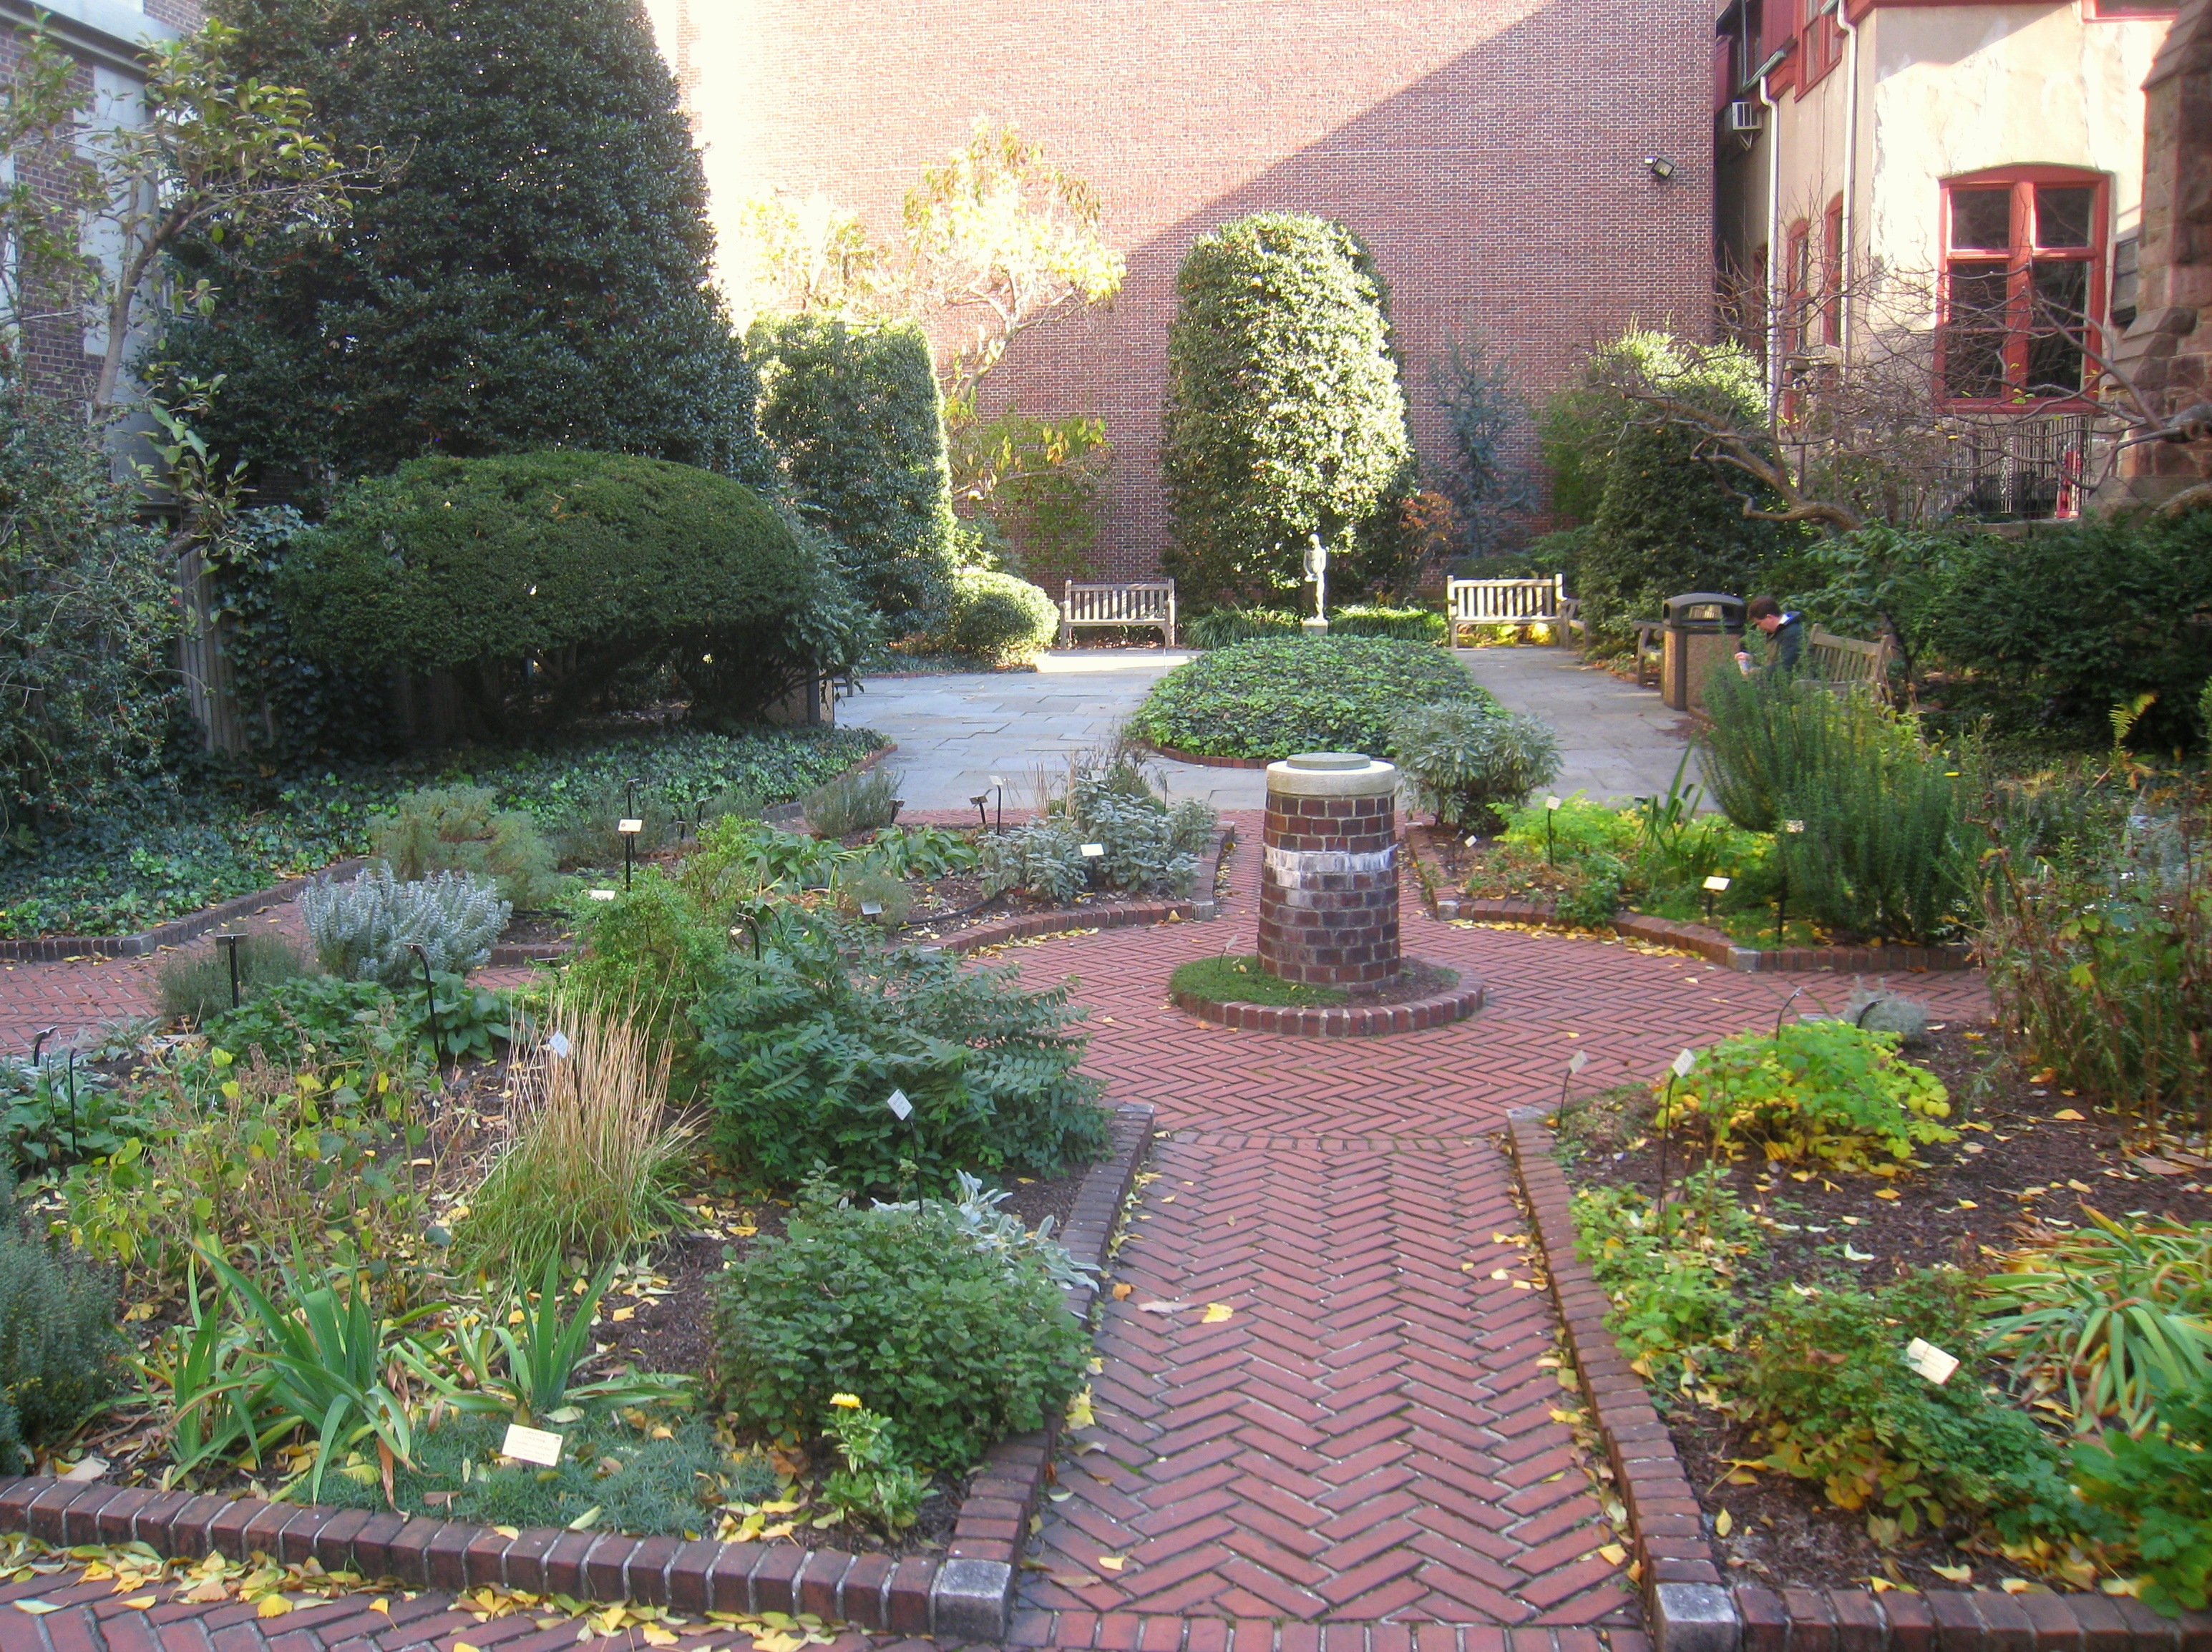 File Benjamin Rush Medicinal Plant Garden   IMG 7239 JPG. File Benjamin Rush Medicinal Plant Garden   IMG 7239 JPG